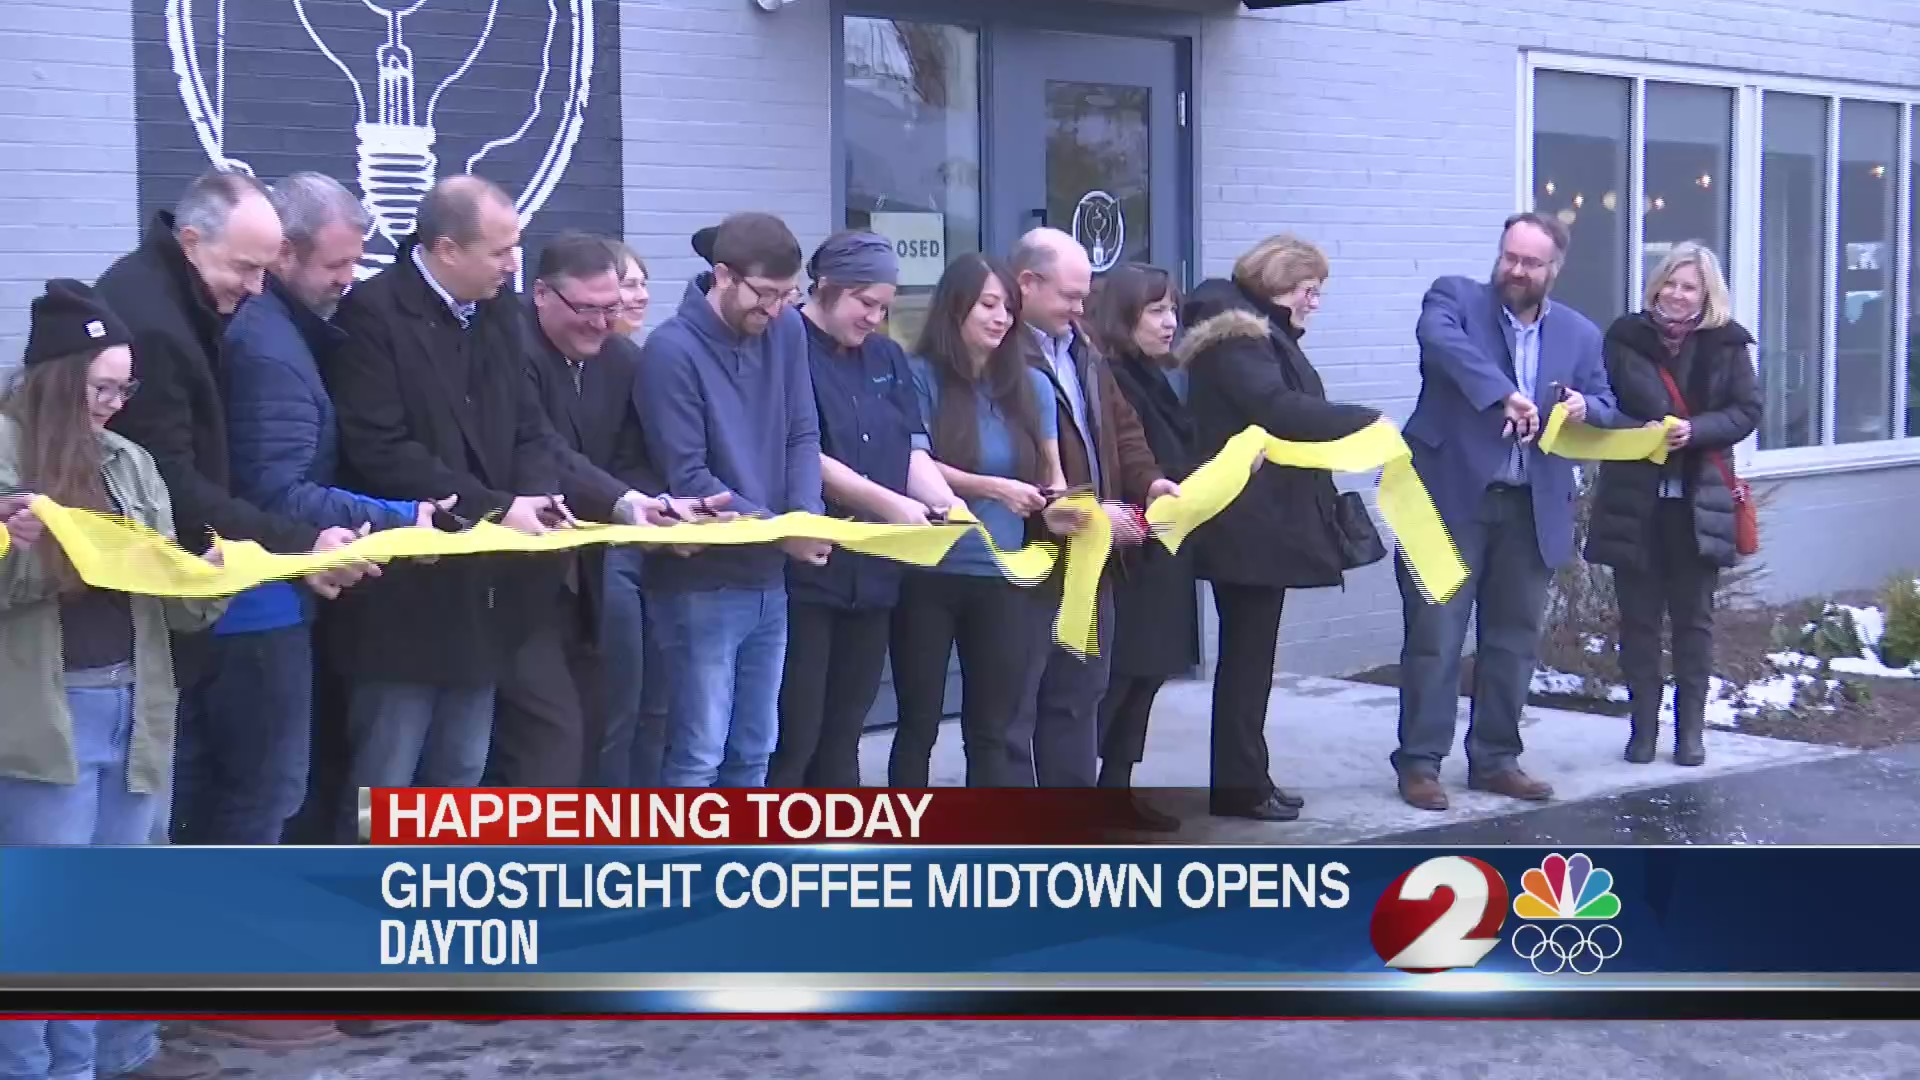 Ghostlight coffee opens midtown location